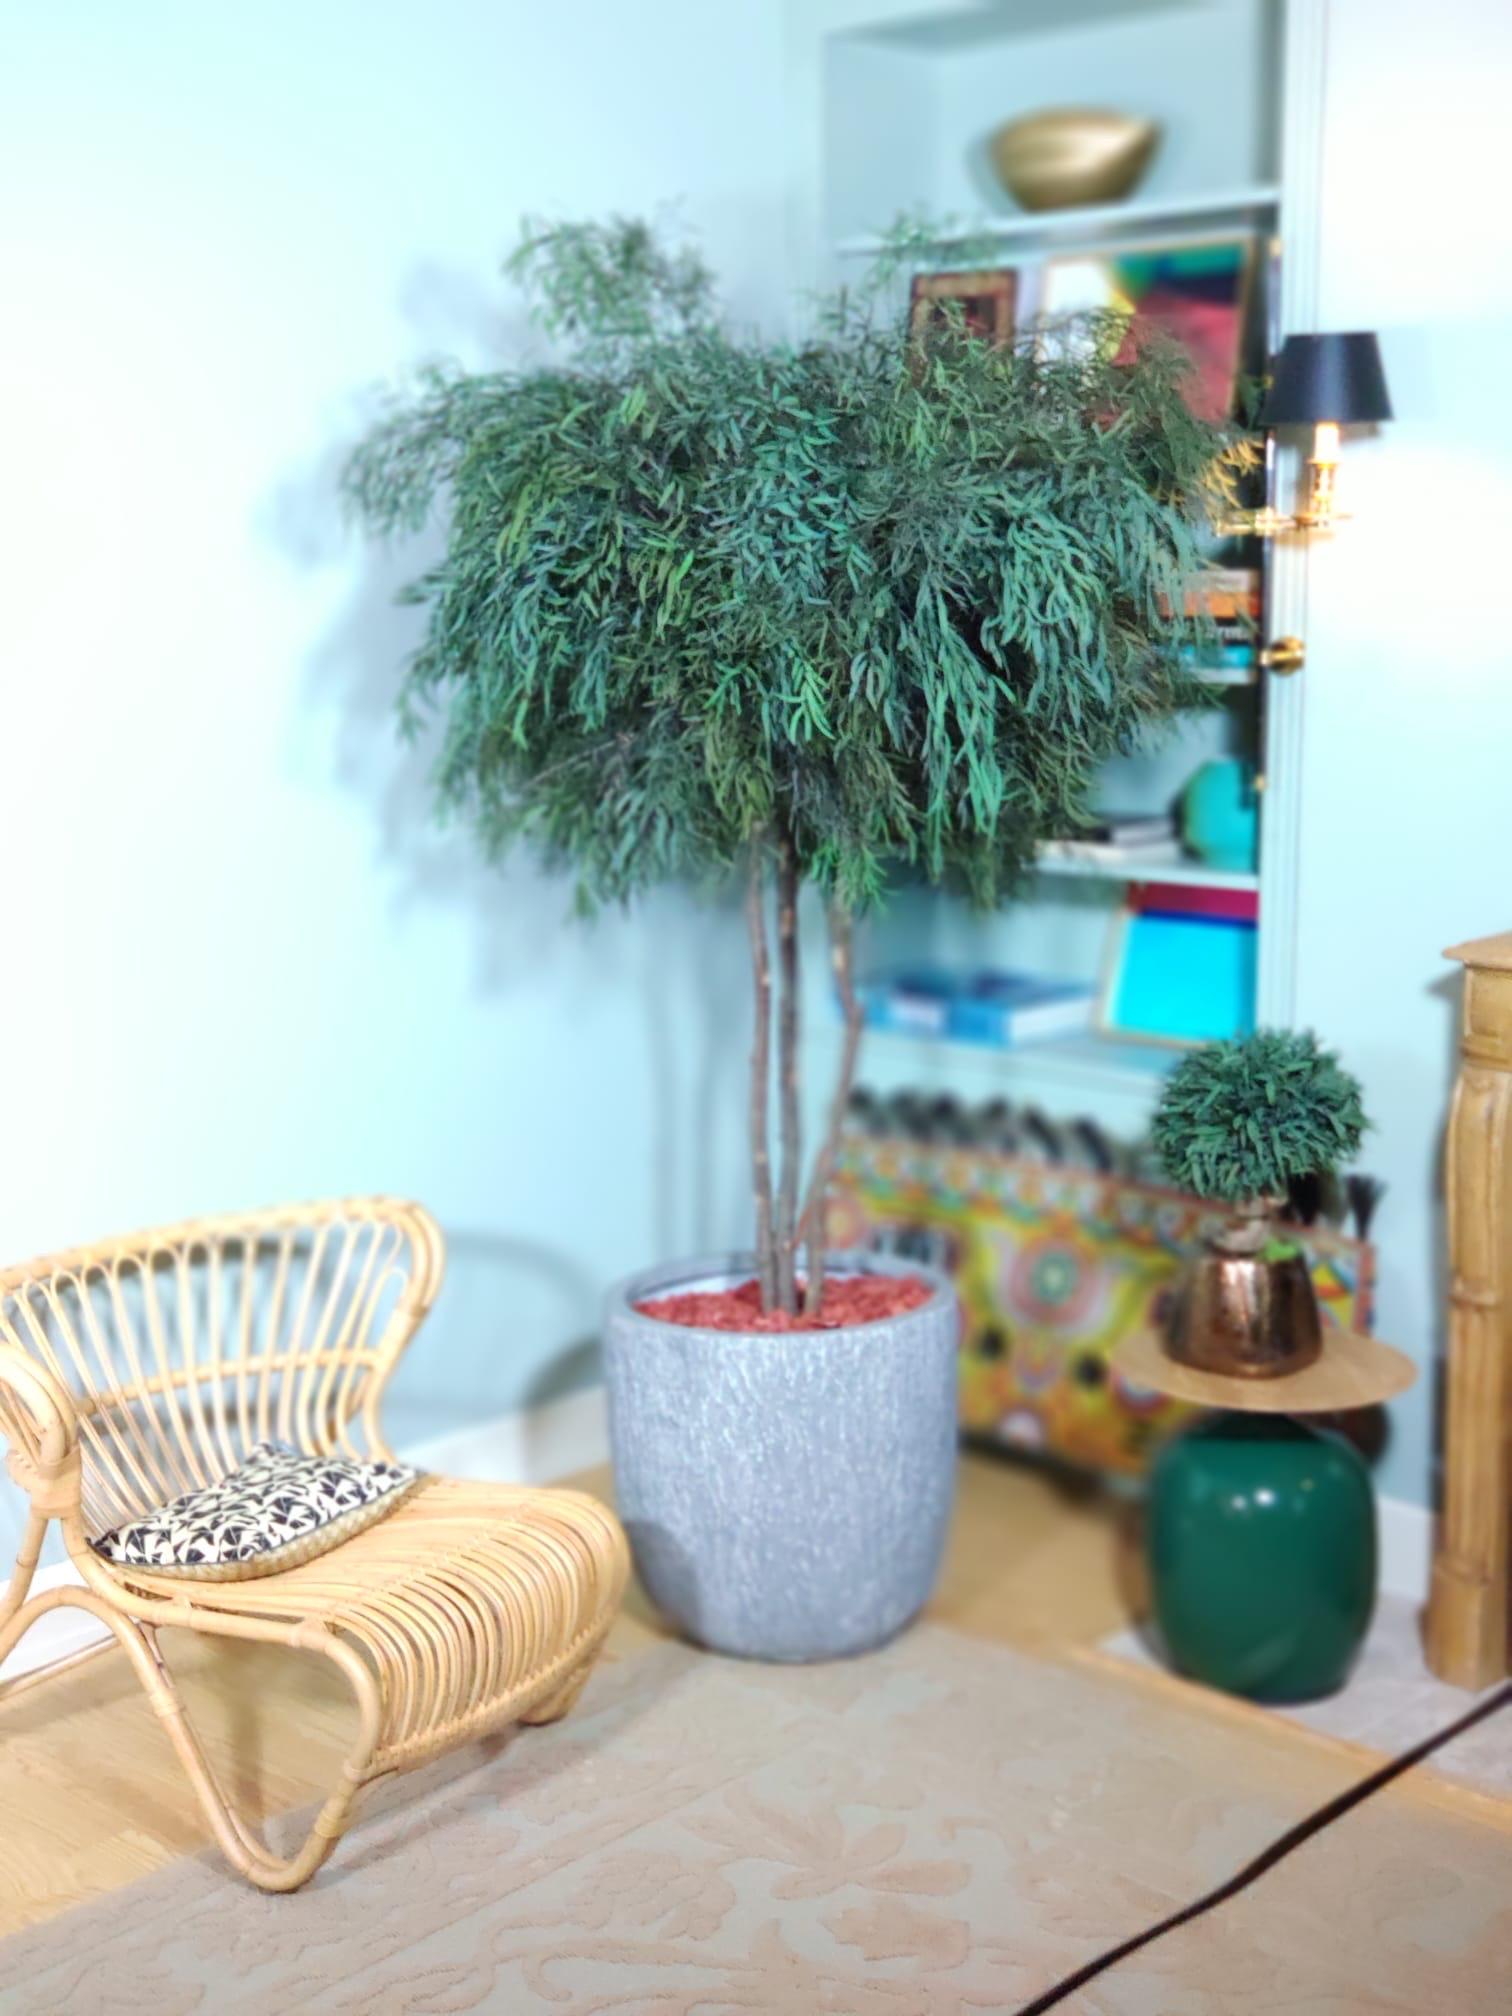 Nicoly, vegetaltrend